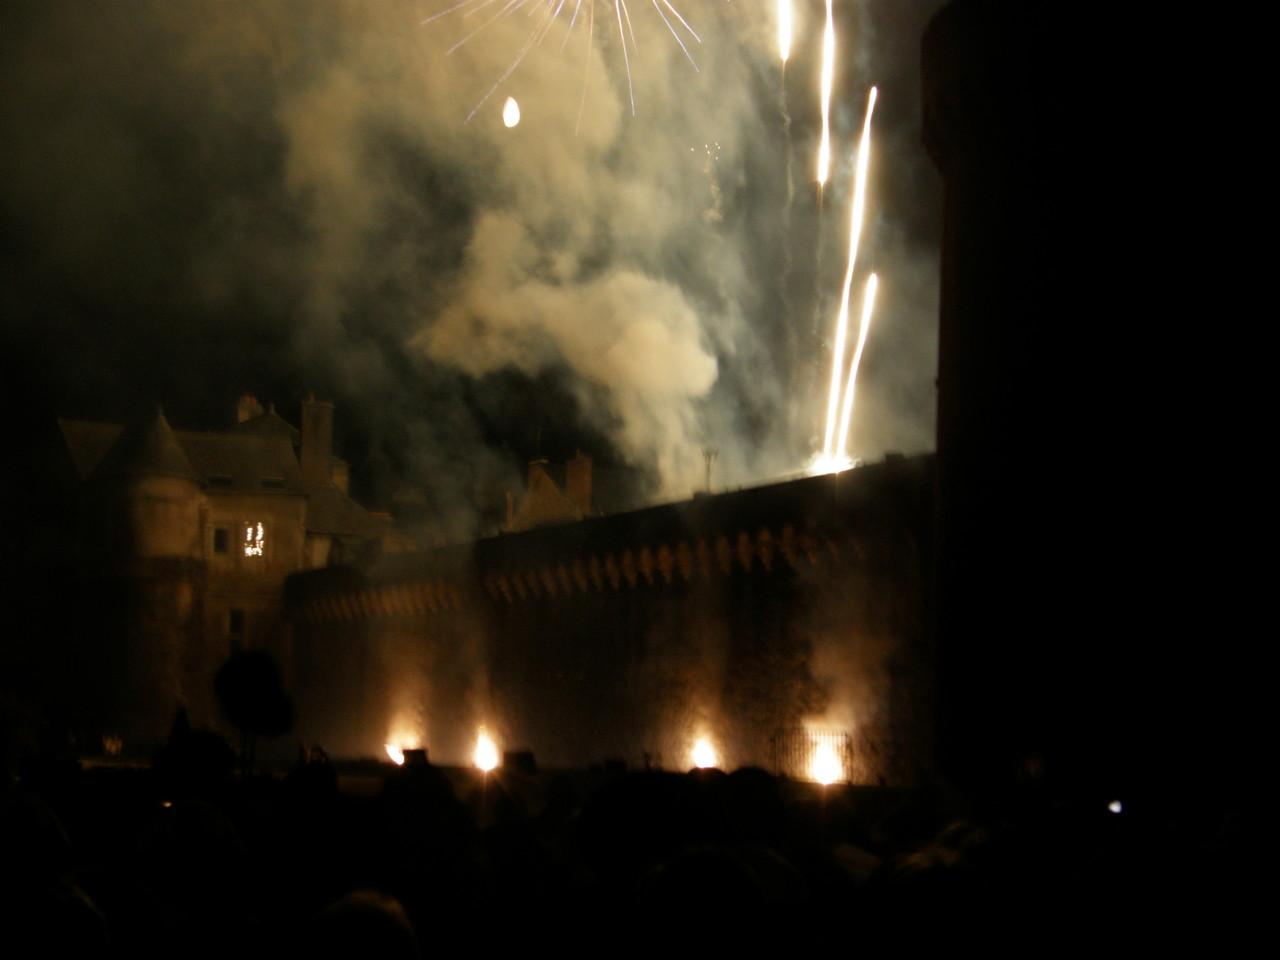 Les remparts enflammés finalisent ses fêtes